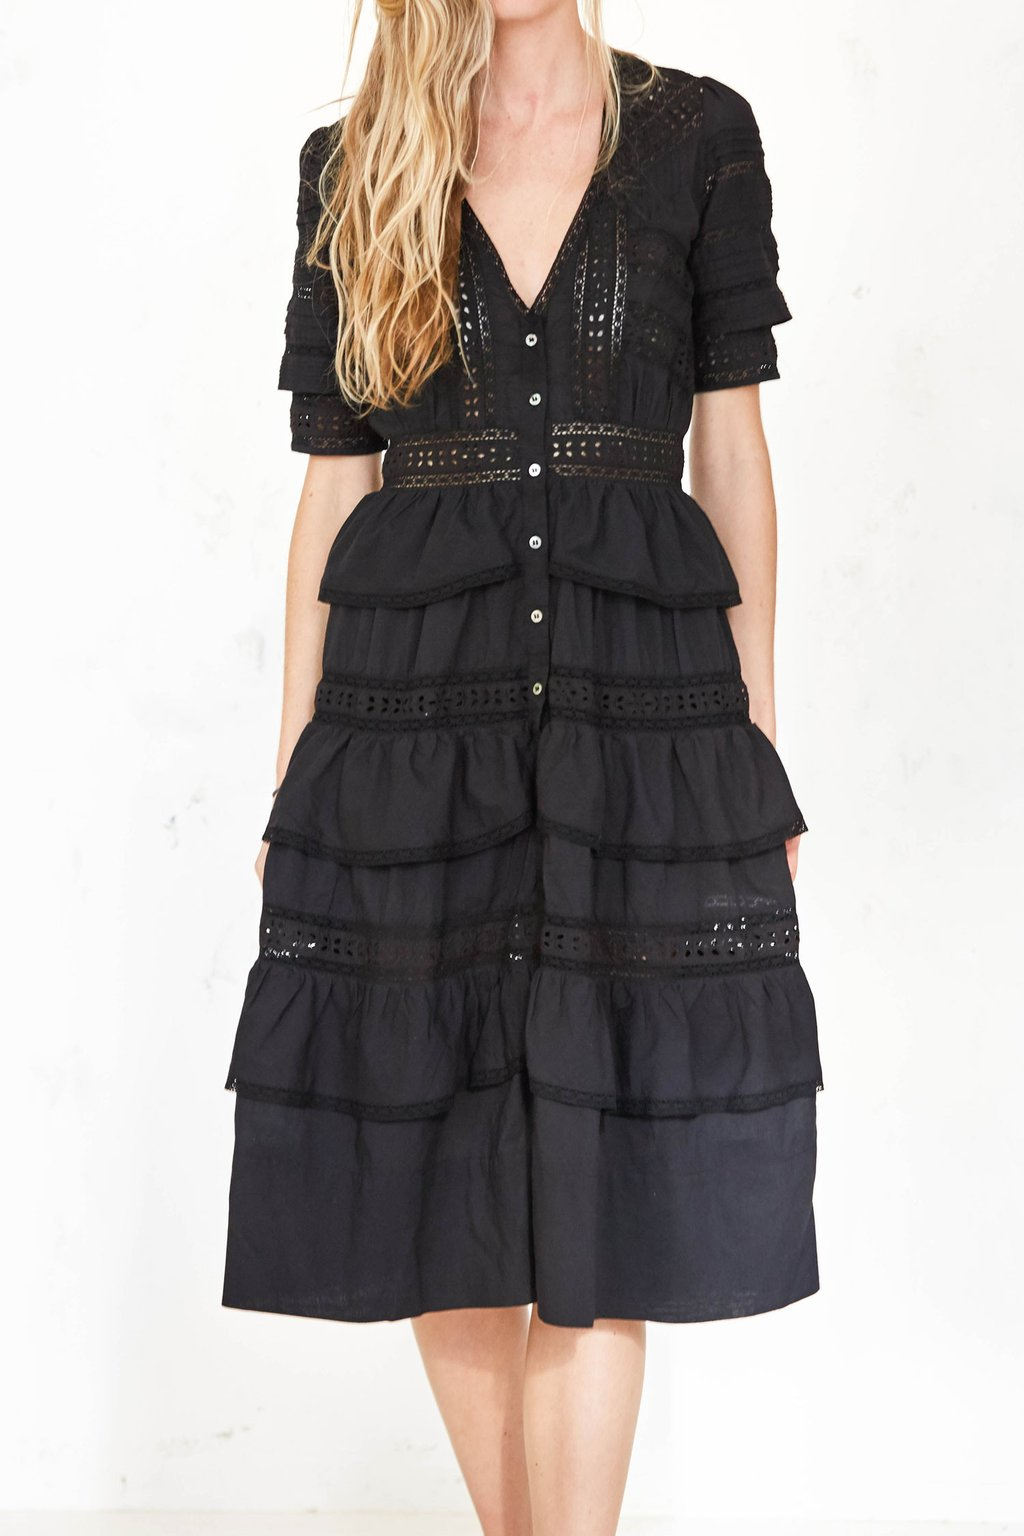 Loveshackfancy-Rebecca-Dress-Black_1024x.jpg